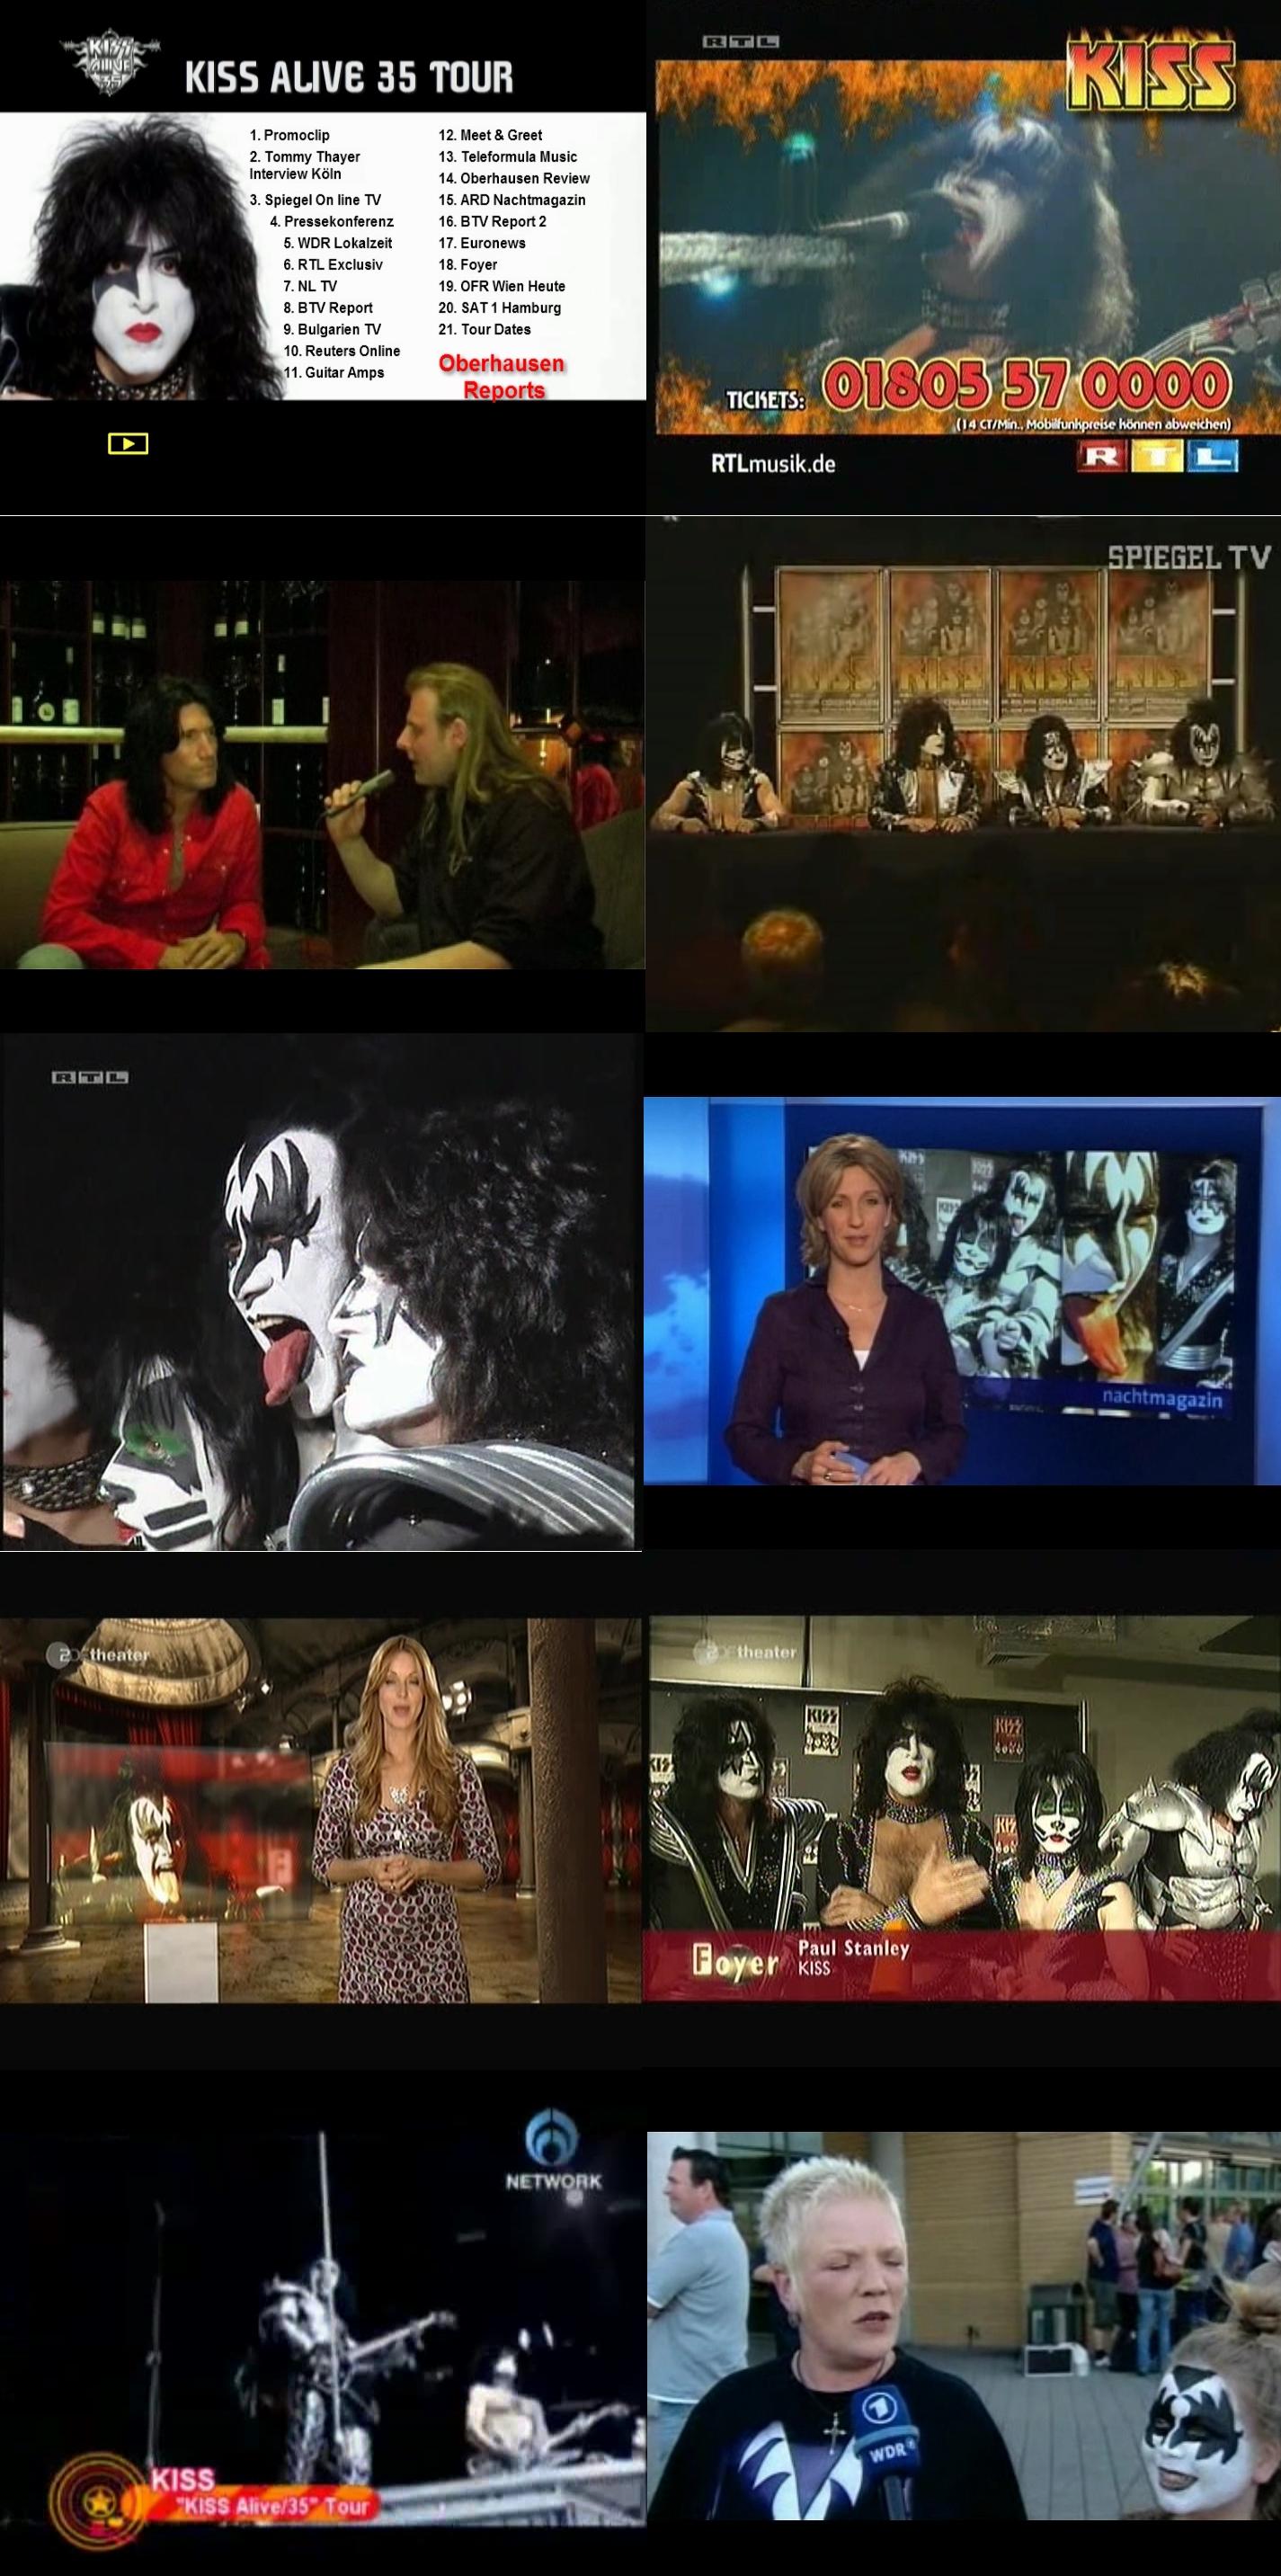 L wdr lokalzeit rtl exclusiv nl tv btv report bulgarian tv reuters online hk tech interview meet greet teleformula music oberhausen review m4hsunfo